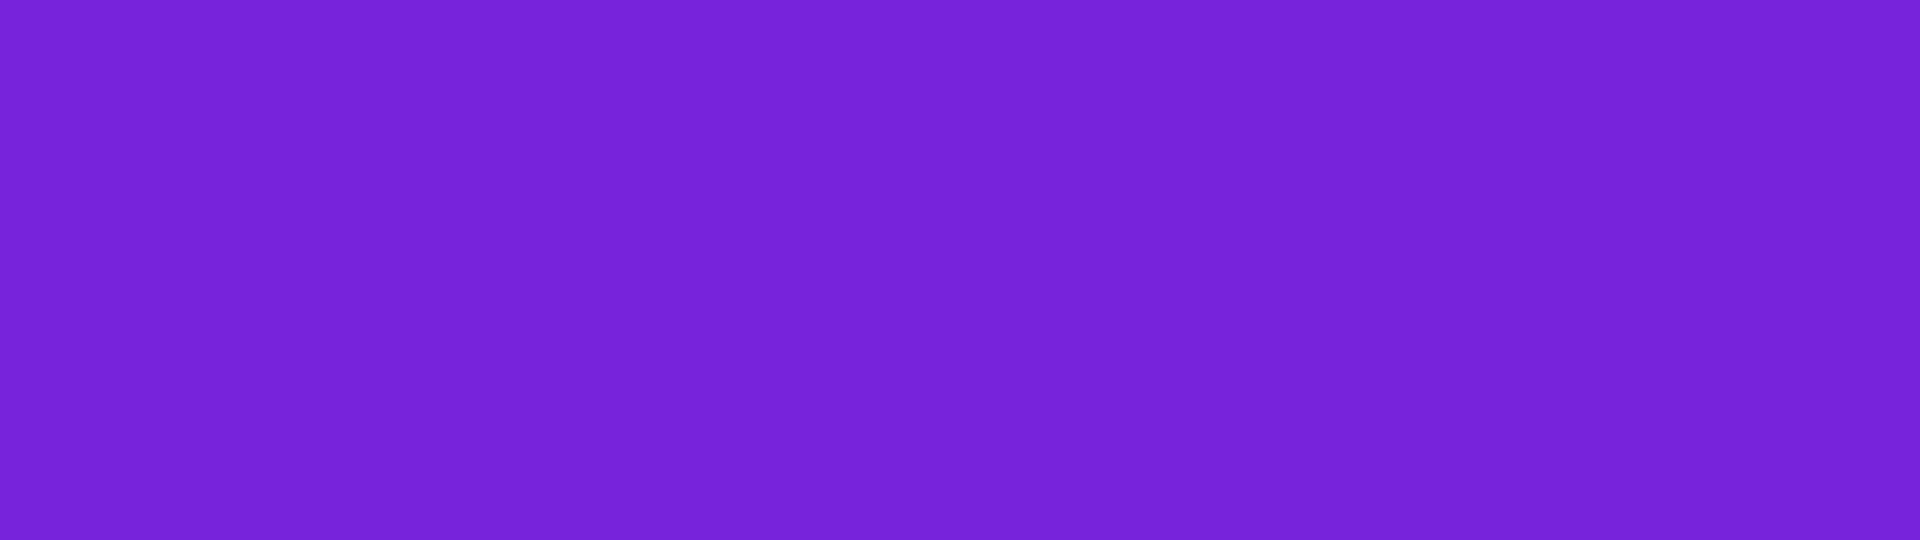 CATEGORY-KOZM-SEBAMEDINENCOKTERCIHEDILEN-22-01